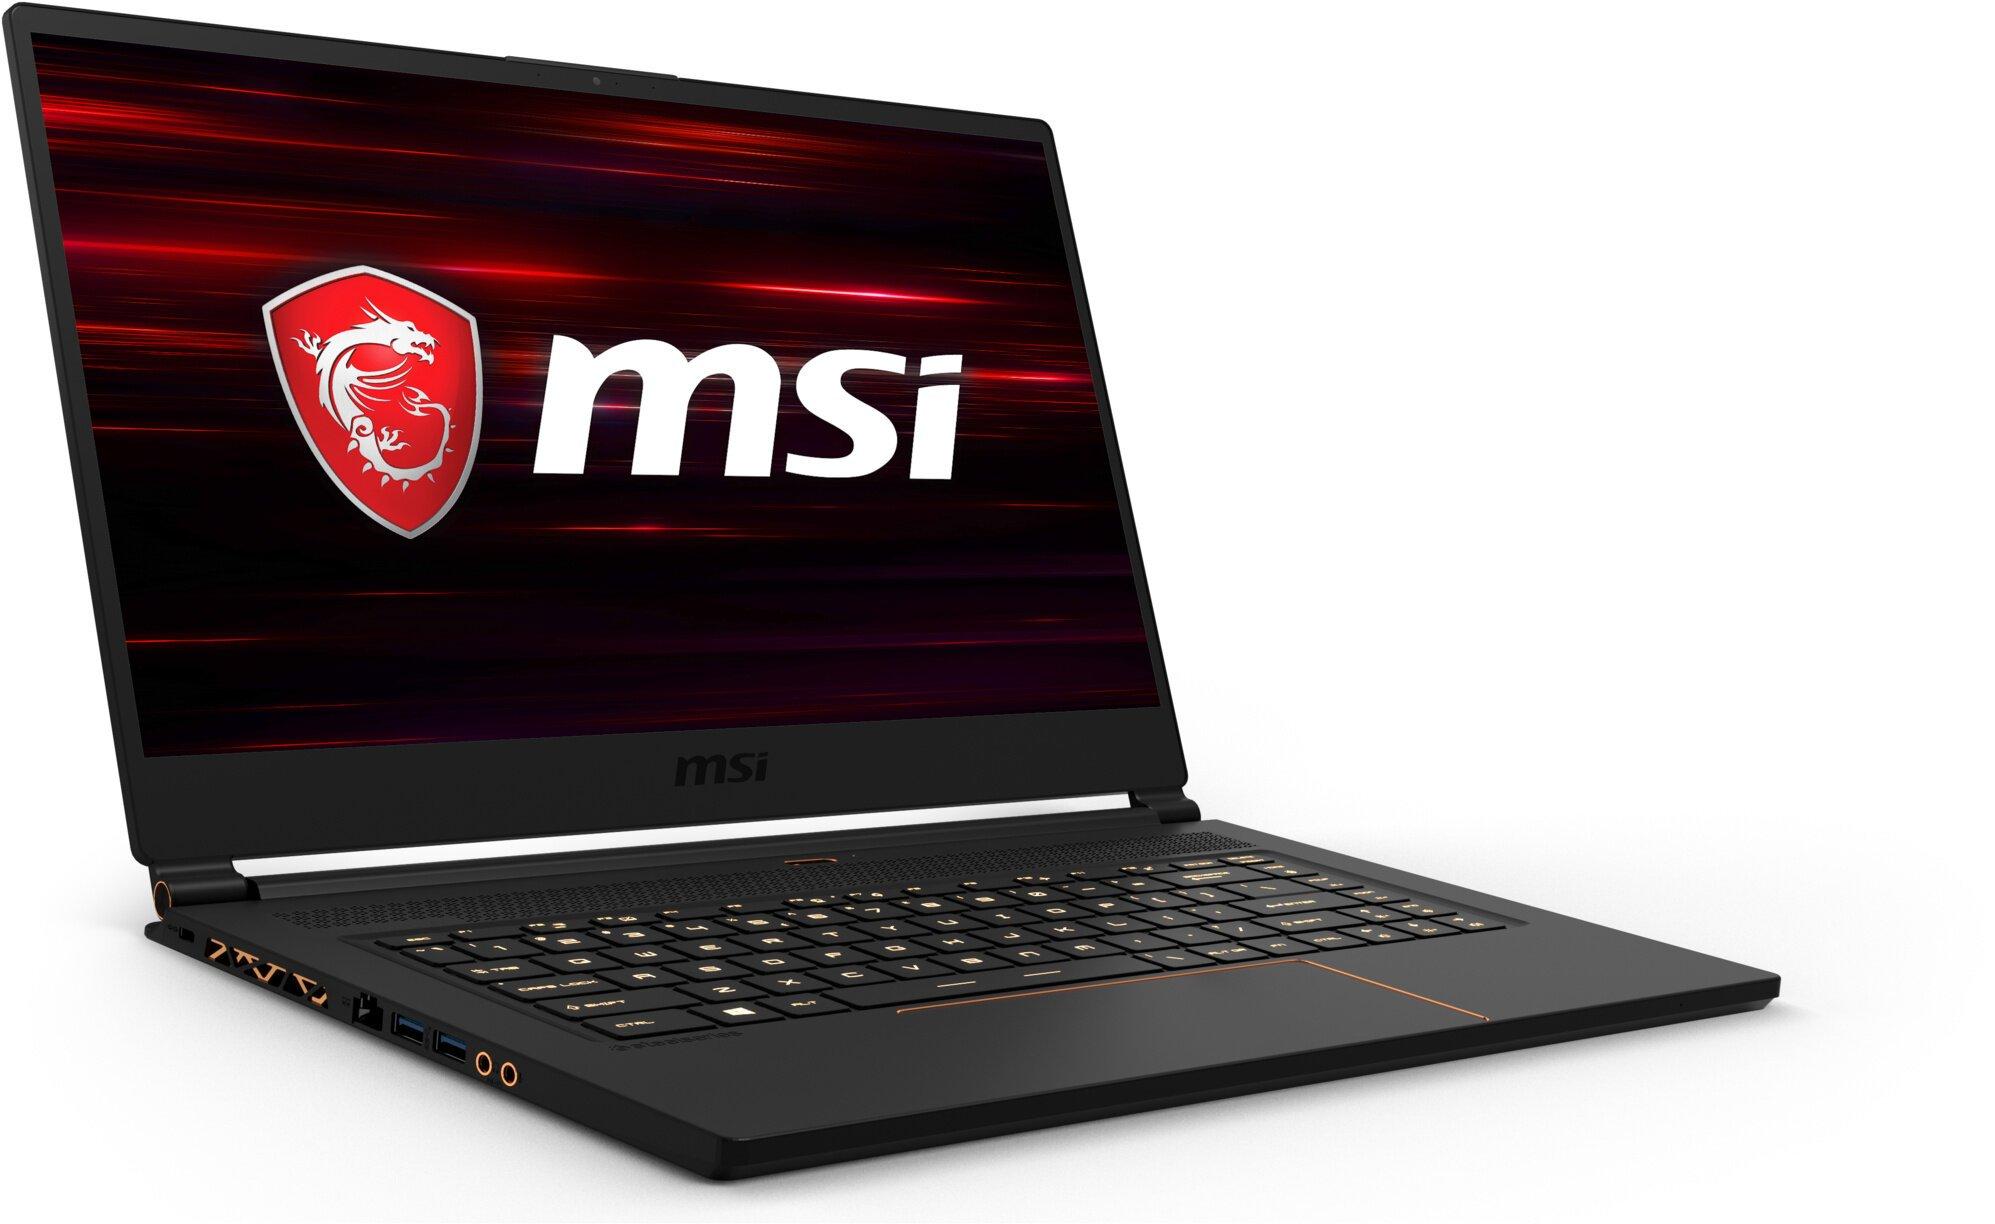 MSI GS65 Stealth 8SE-037ES